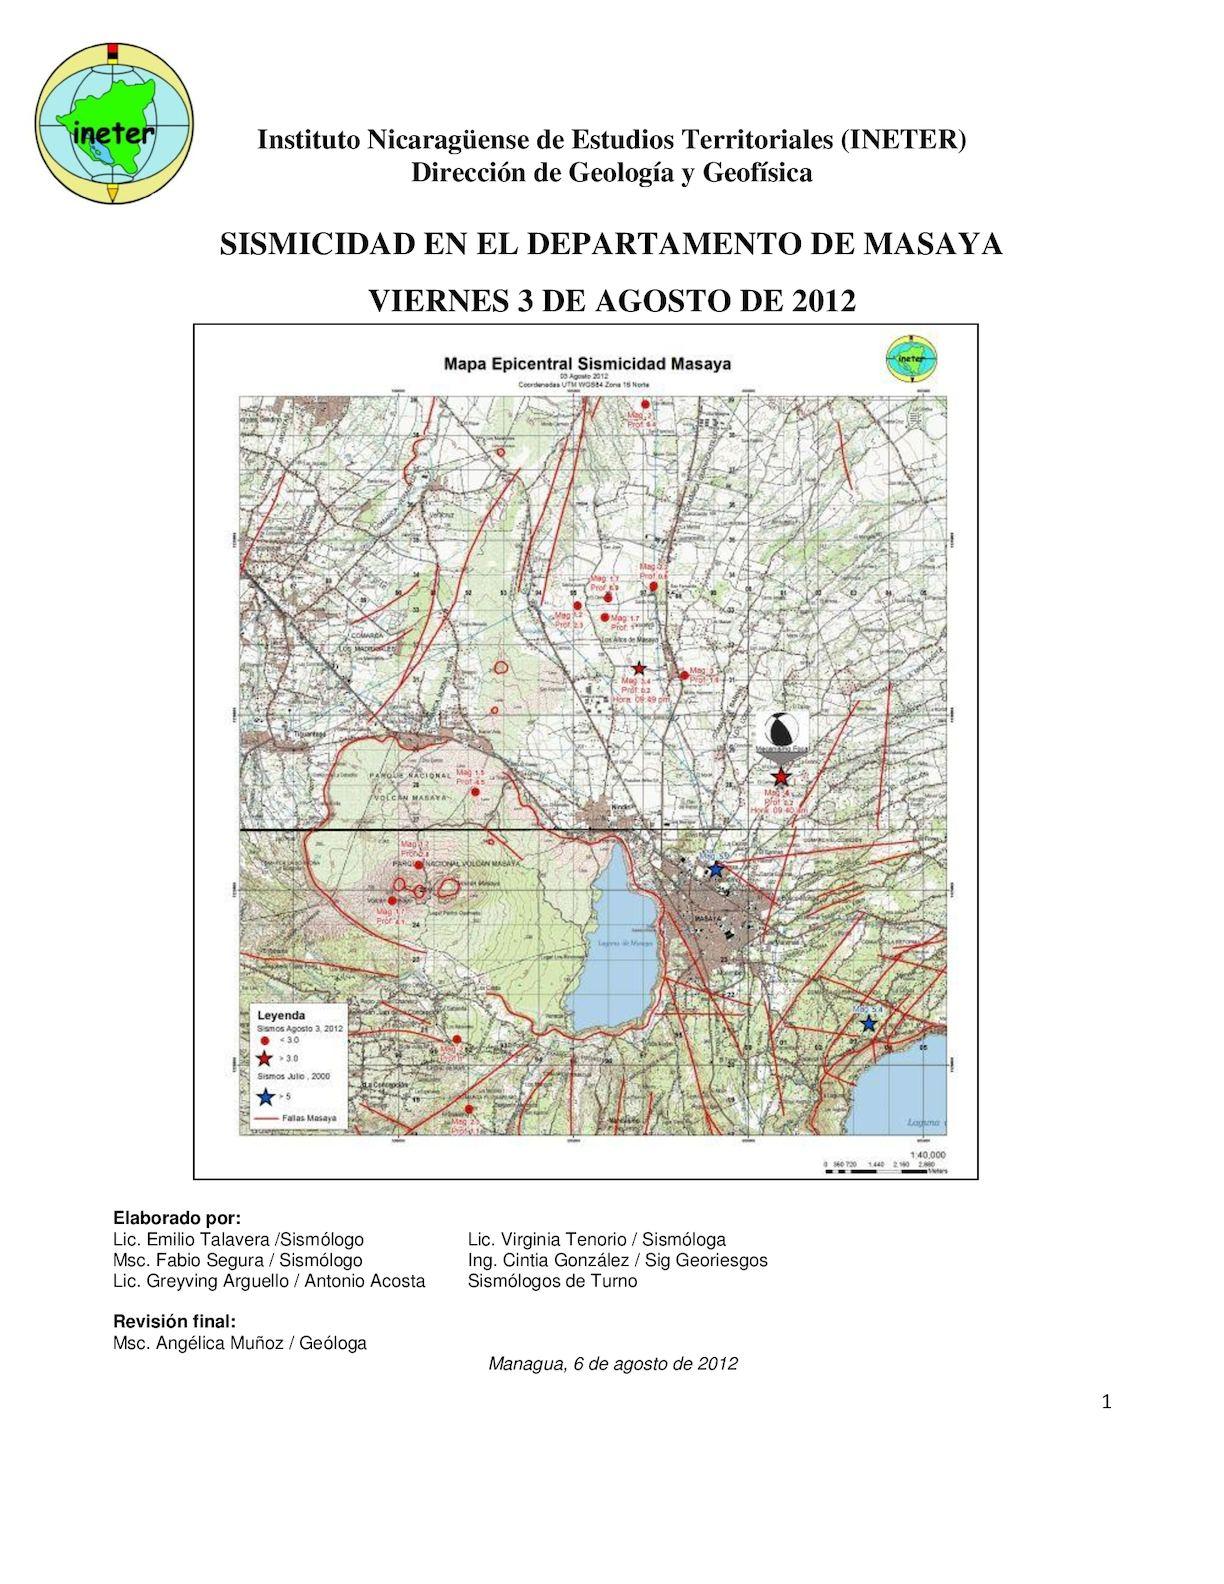 Informe Sismicidad Masaya030812[2]